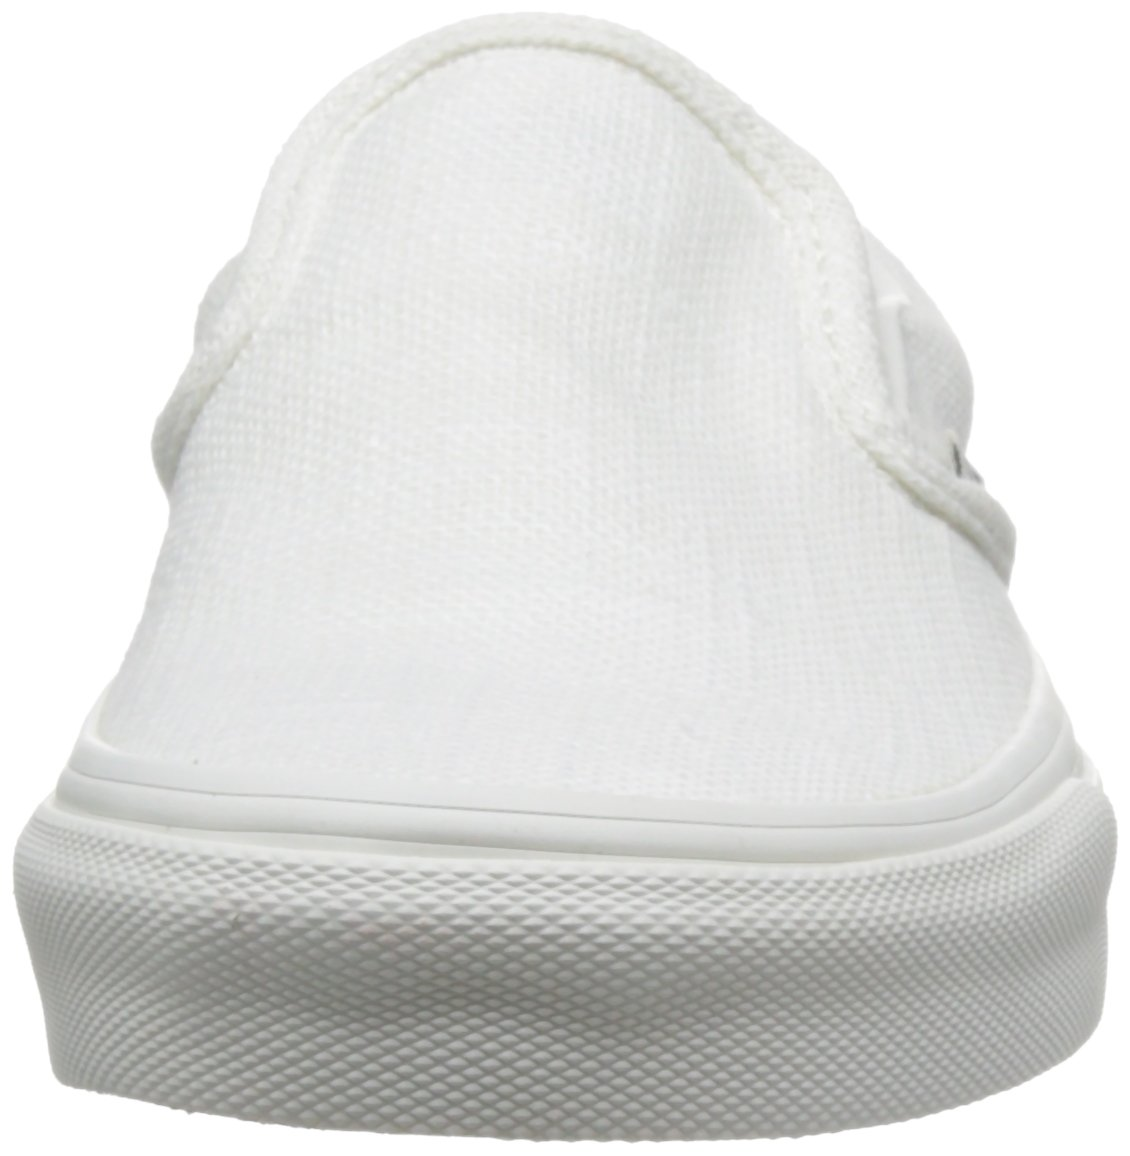 Vans Unisex Classic (Checkerboard) Slip-On Skate Shoe B01K5TVZFO 8.5 M US Women / 7 M US Men|Blanc De Blanc